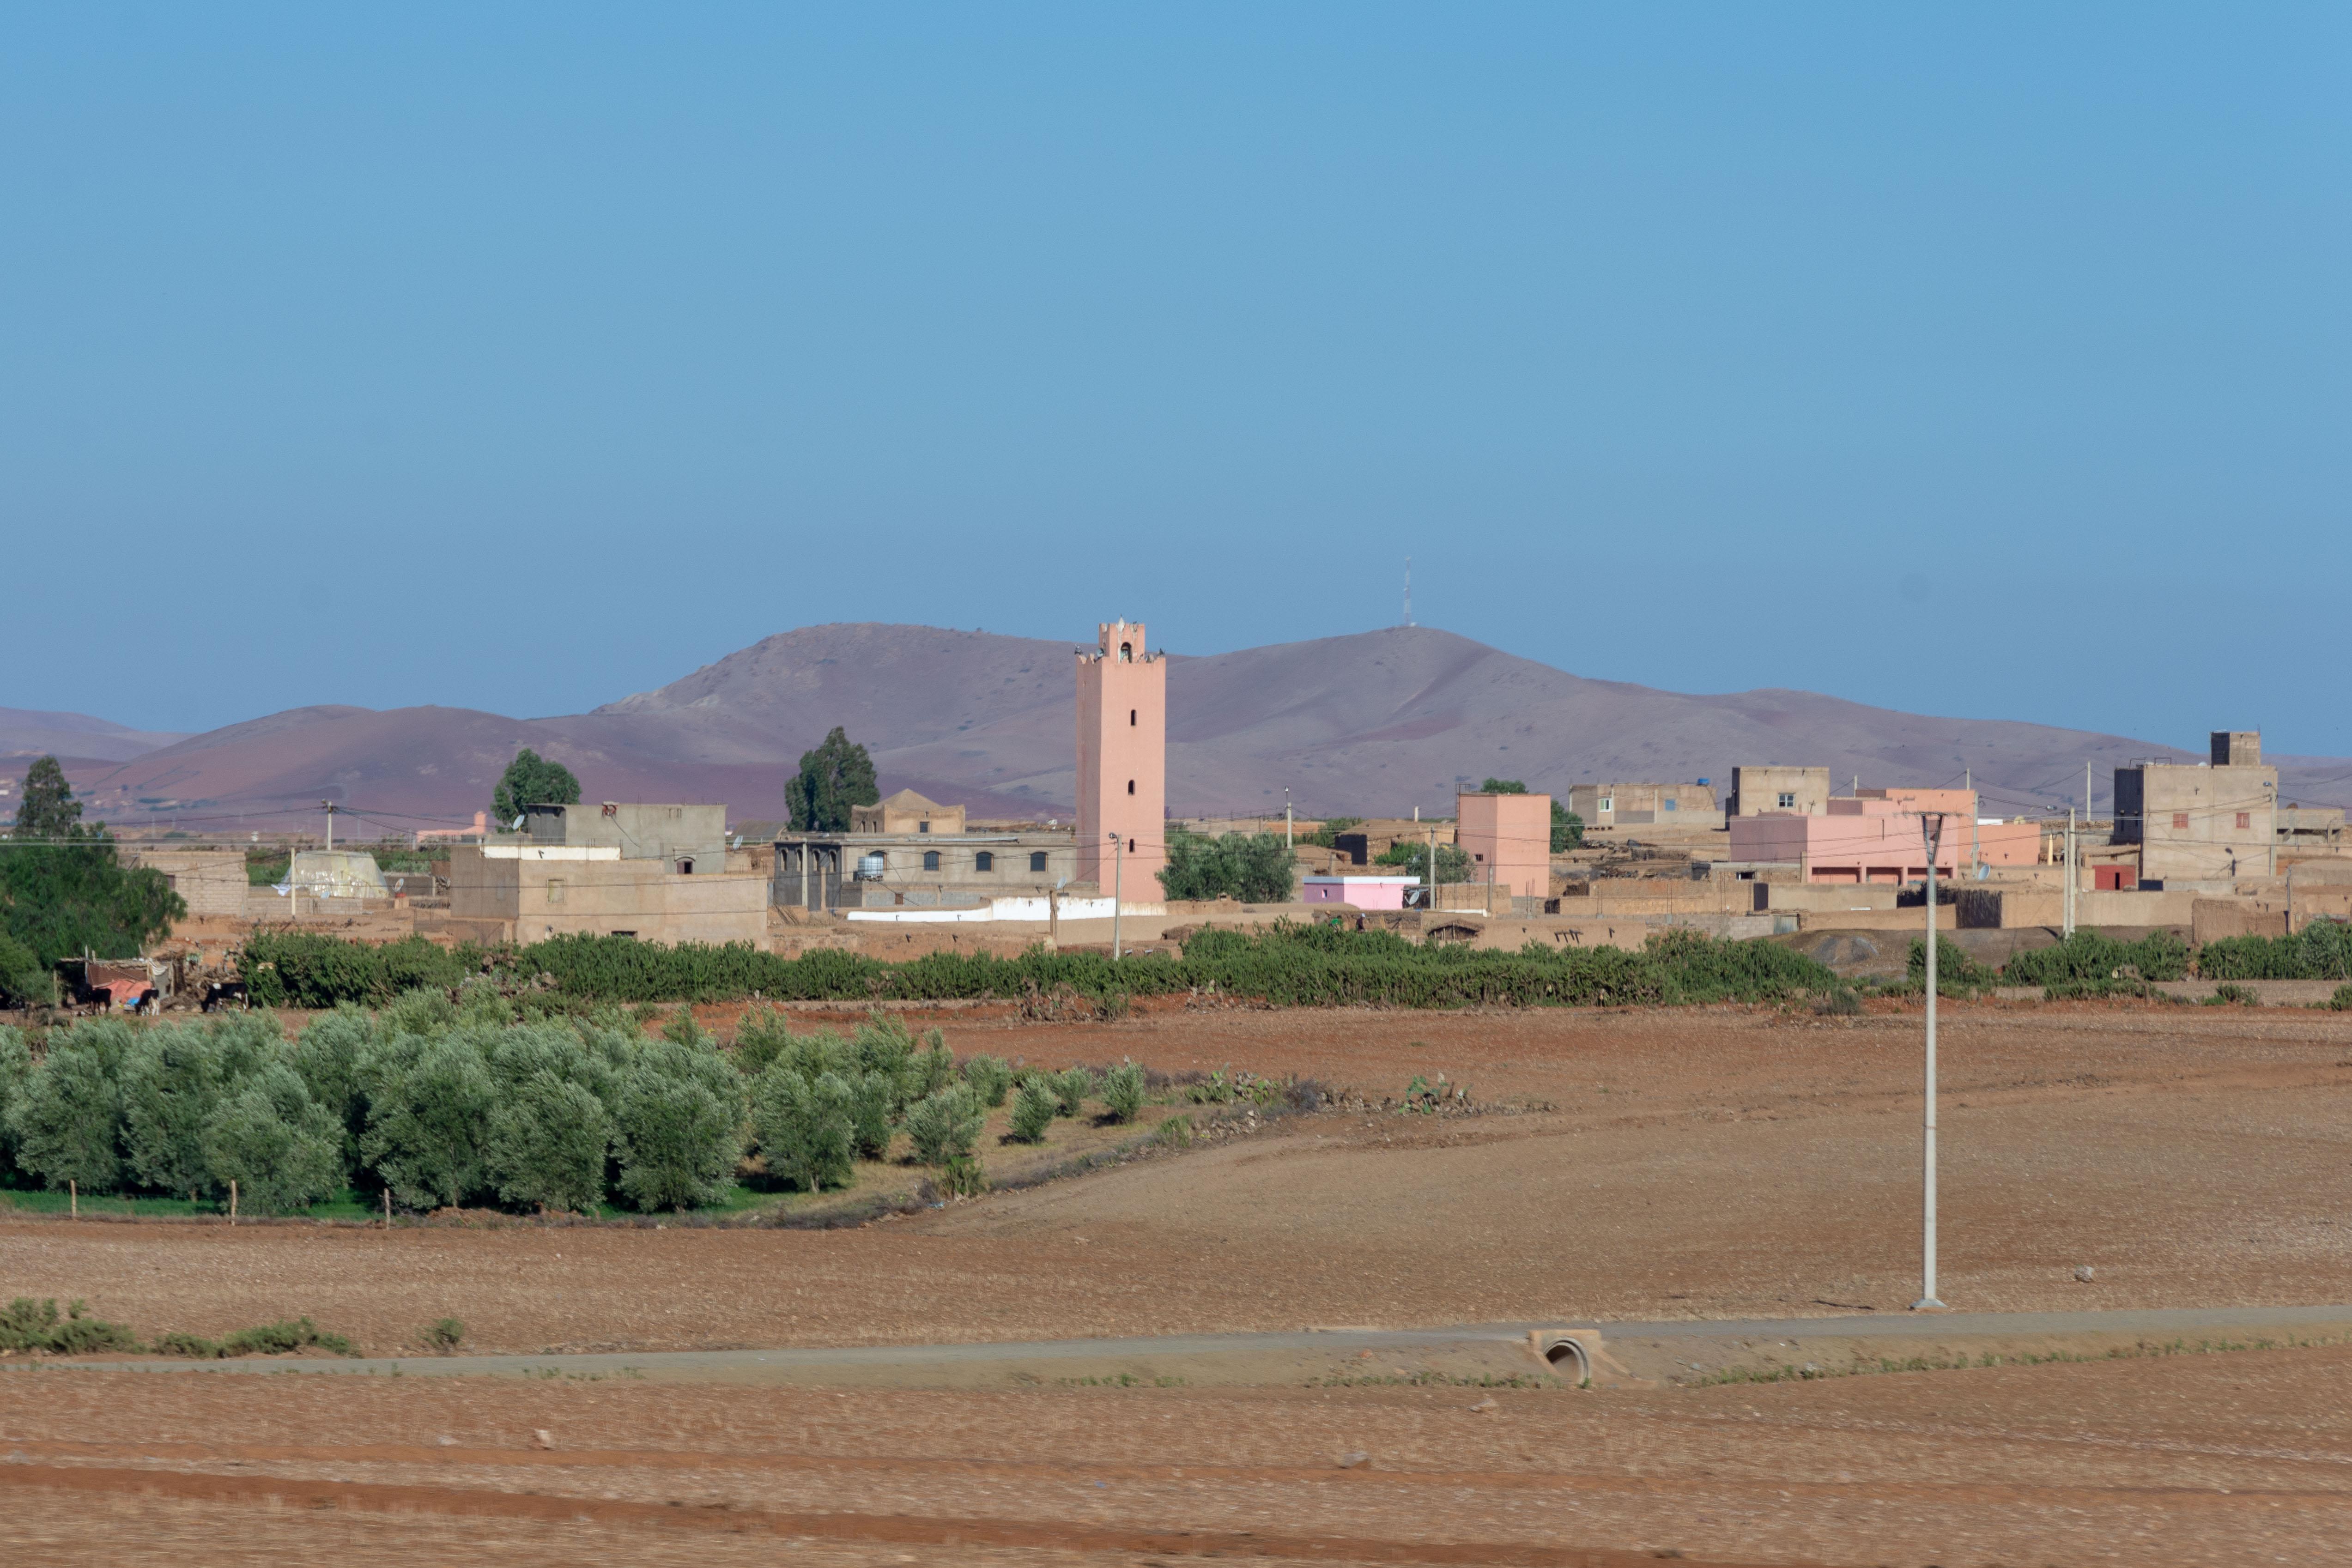 20181001_Marokko_016